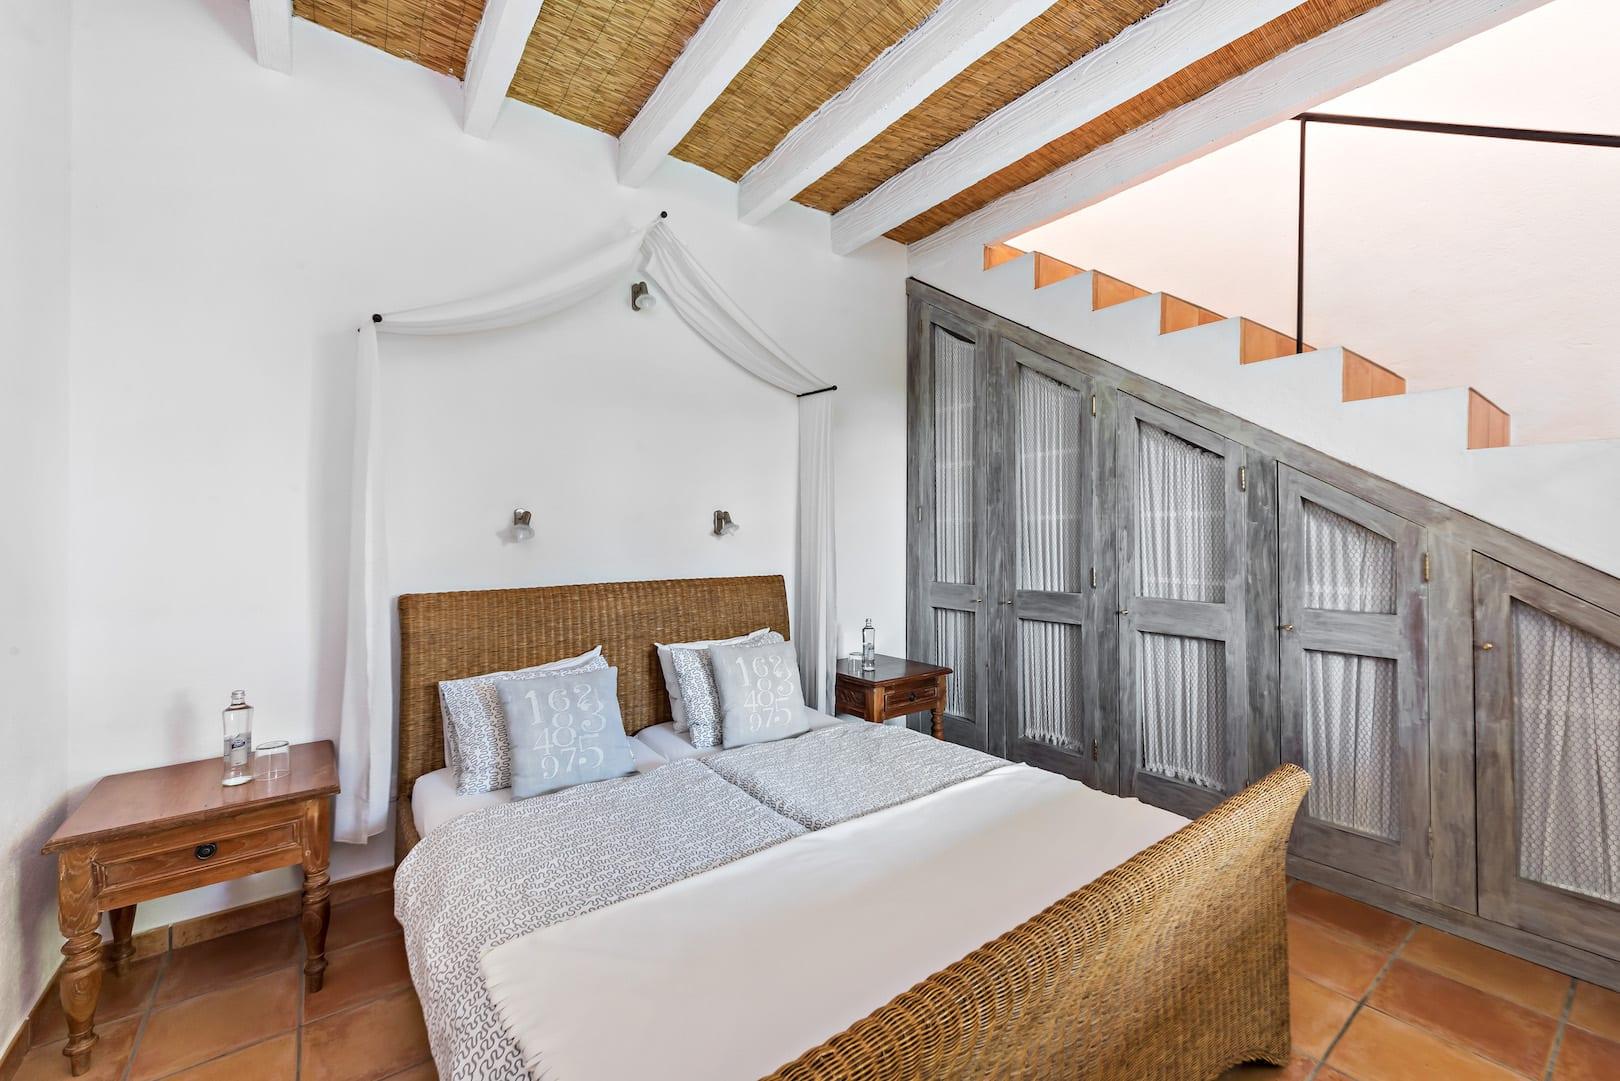 ISLA-Travel-Amapola-Maisonette-Suite-SZ TulipanHiedra (1)